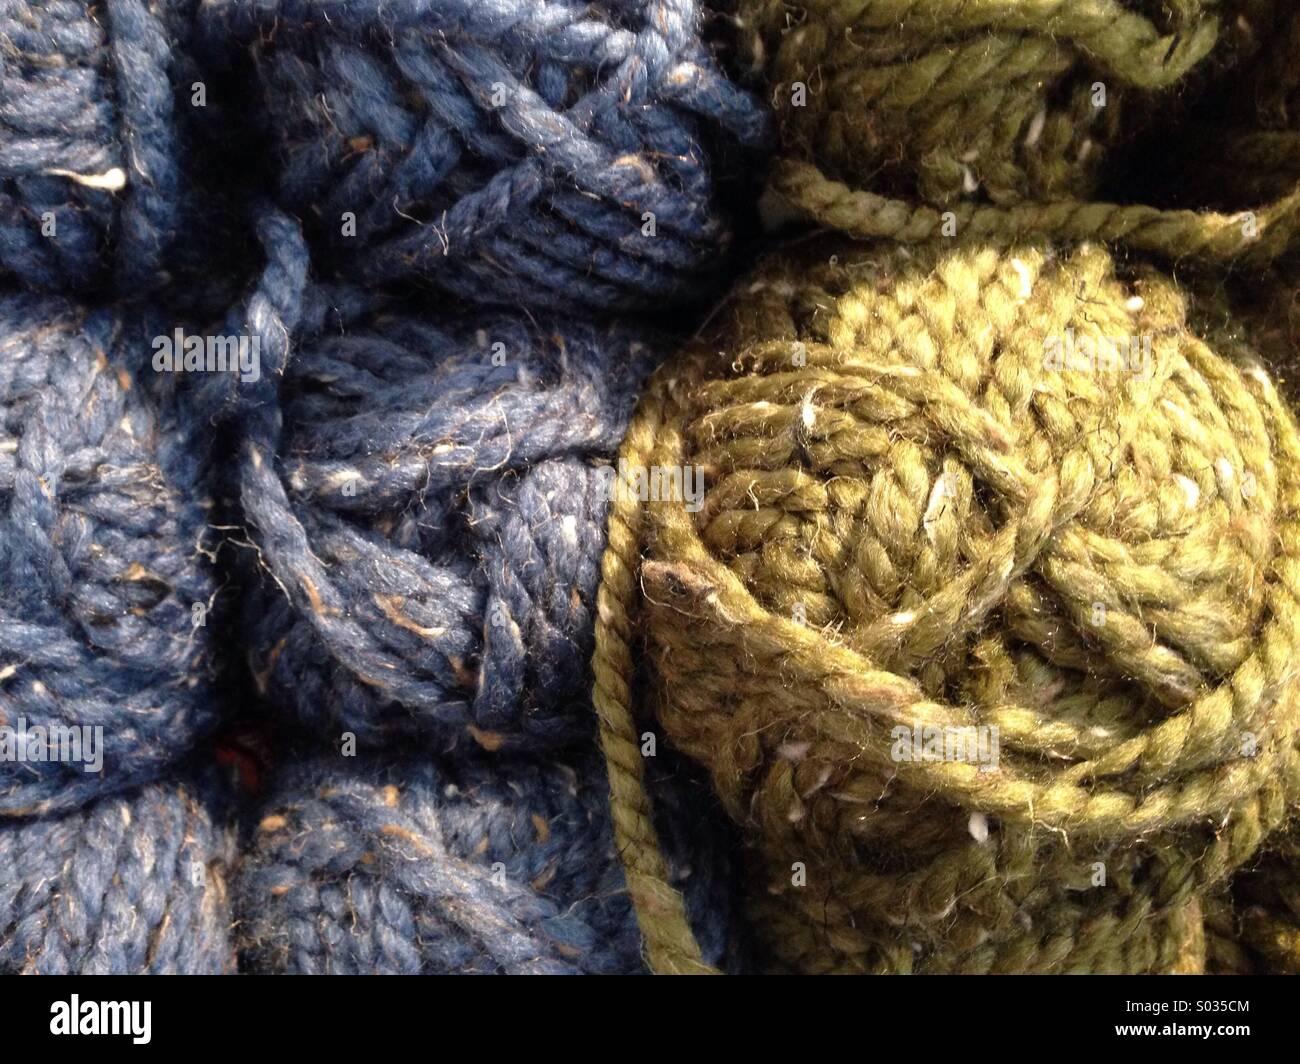 Skein of yarn - Stock Image